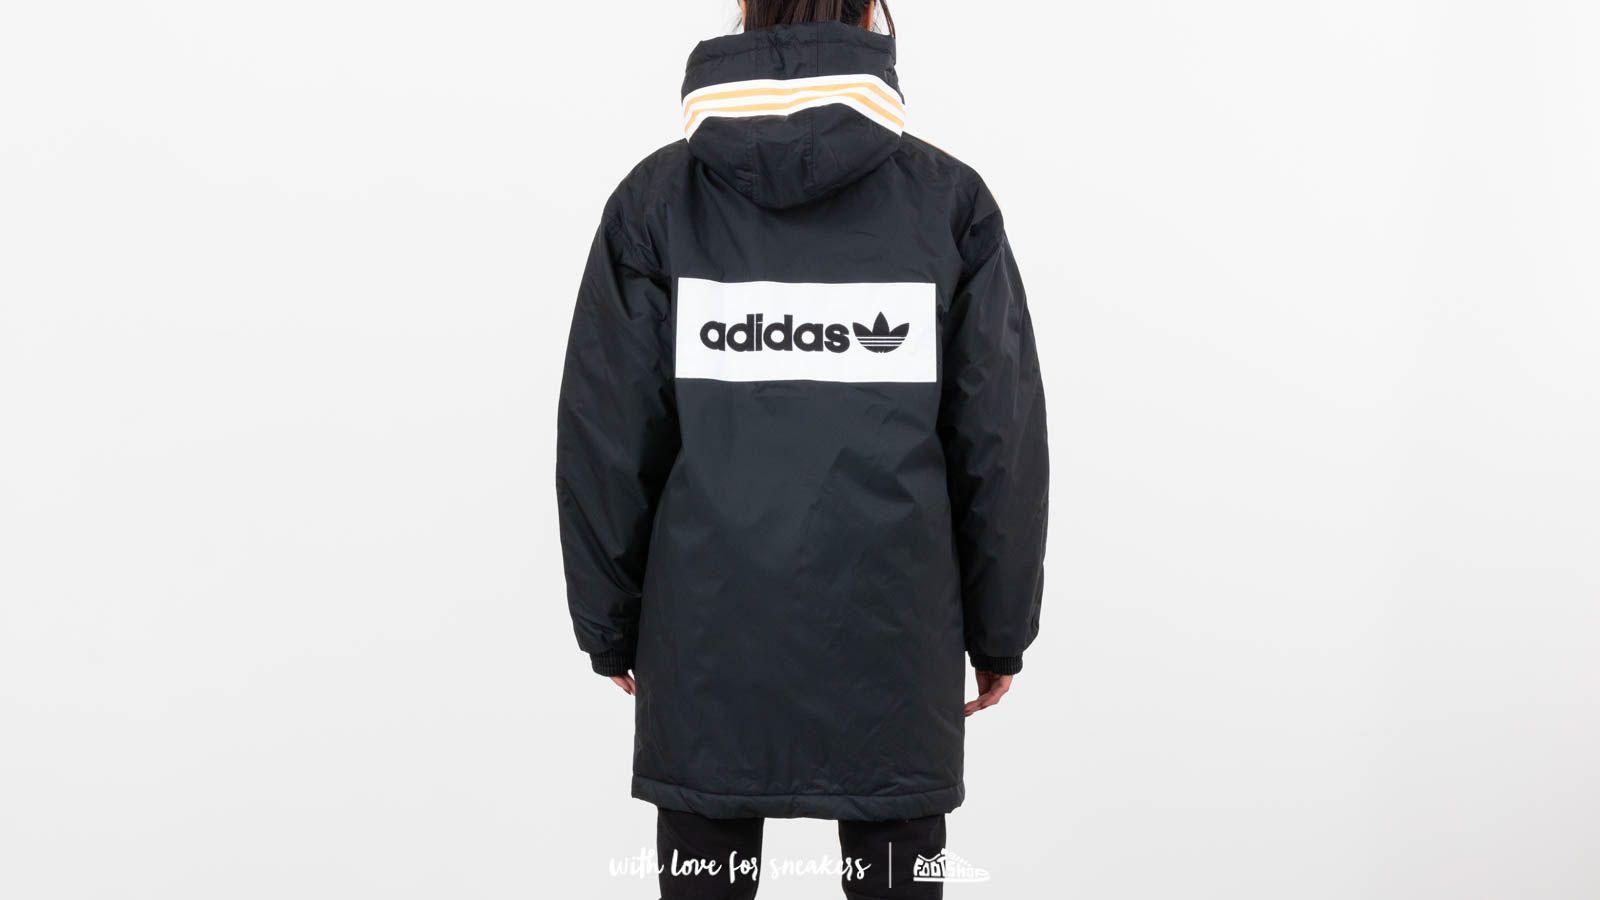 4704f8f62a44 adidas SST Stadium Jacket Black at a great price 174 € buy at Footshop